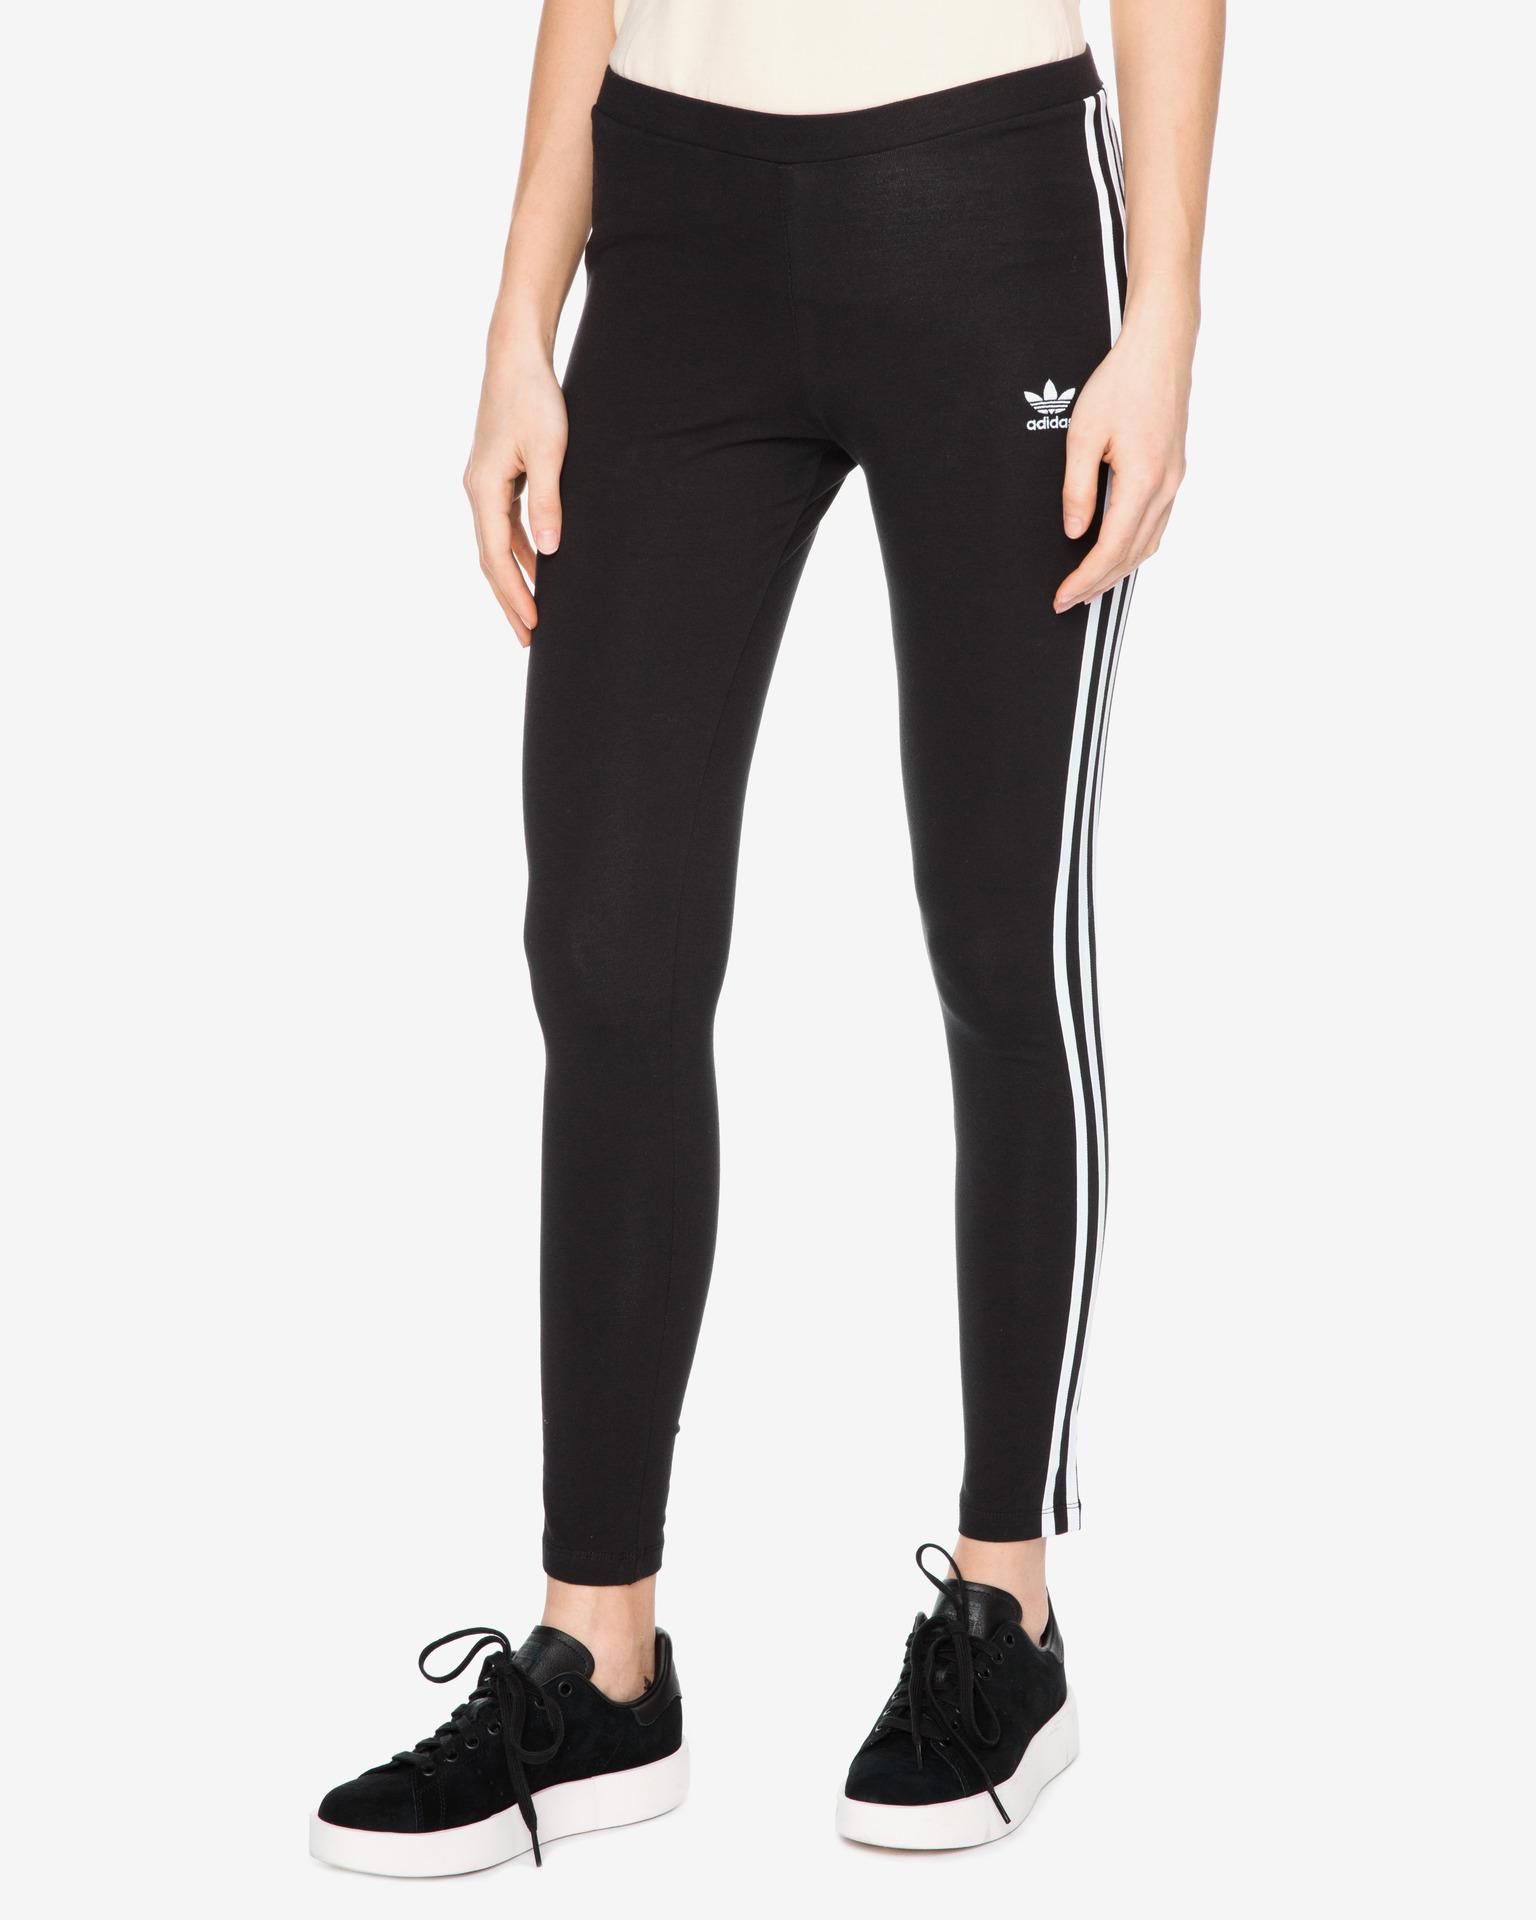 adidas Originals - 3-Stripes Legíny  def3918c85